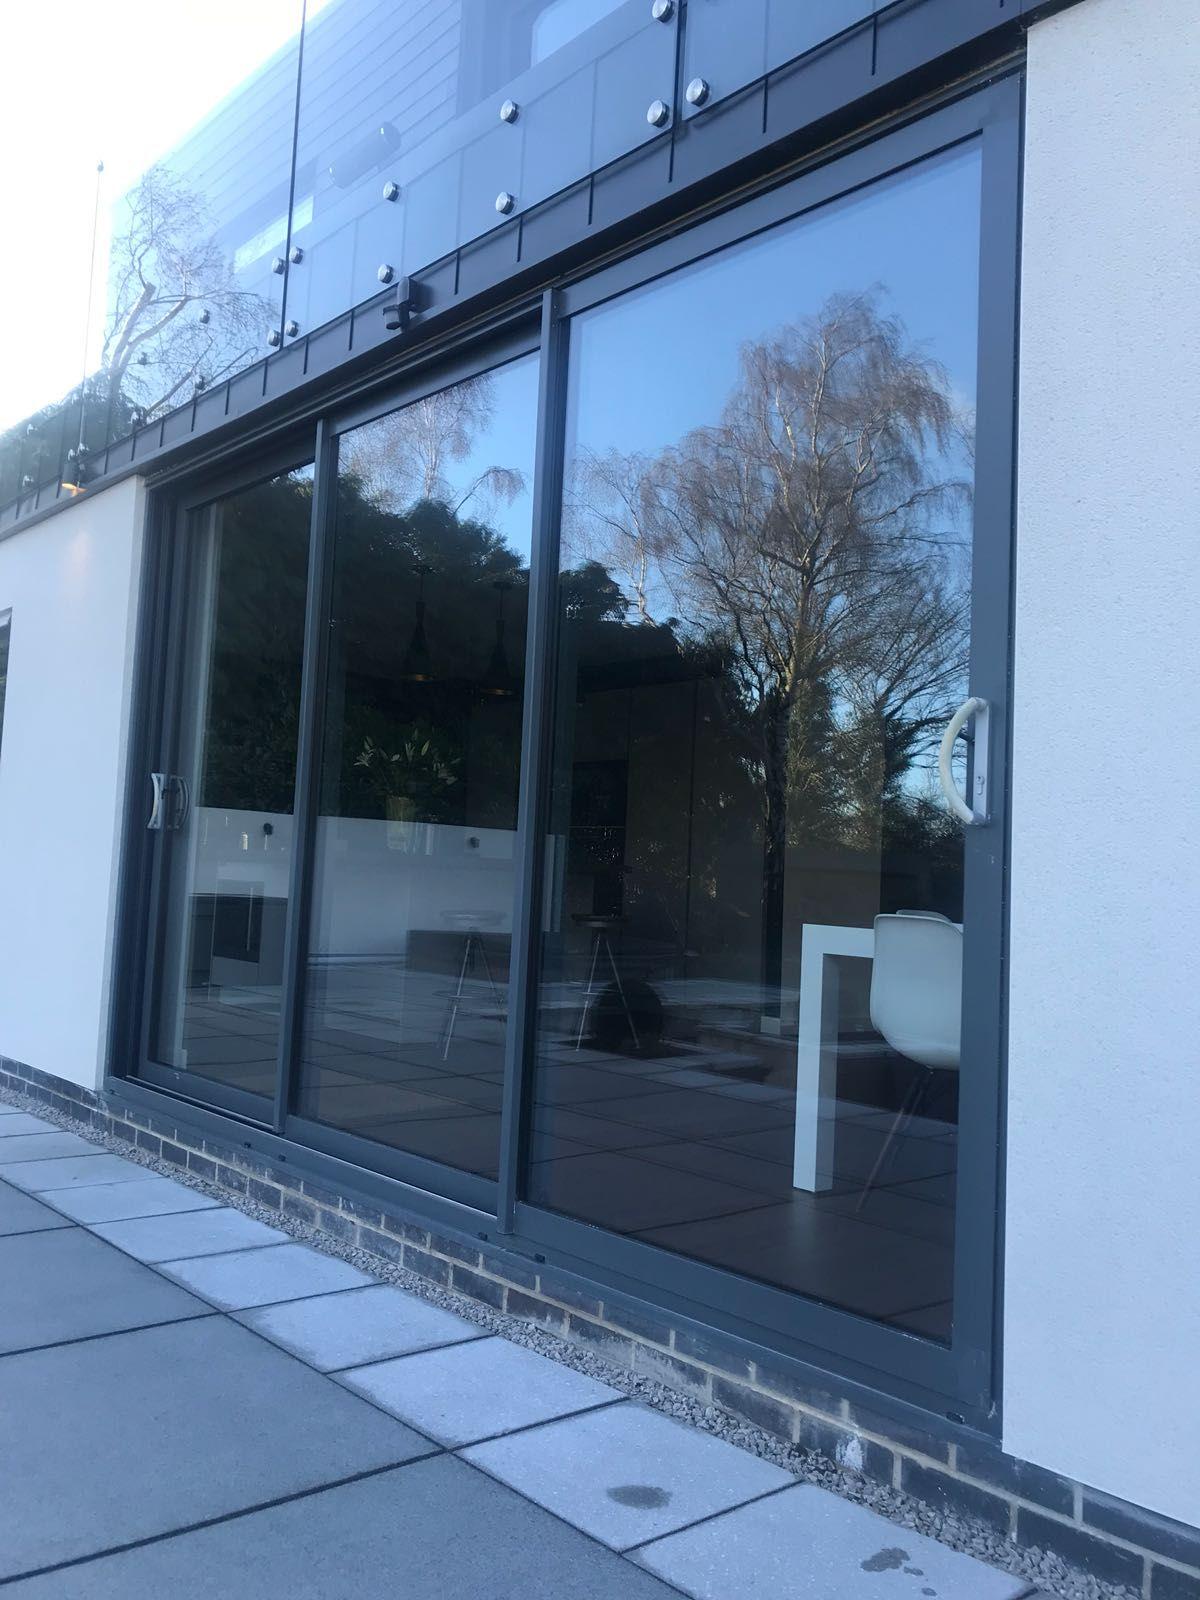 Attrayant Bespoke Iron Grey Smart Architectural Aluminium Triple Track Sliding Patio  Door With Satin Hardware. Installed